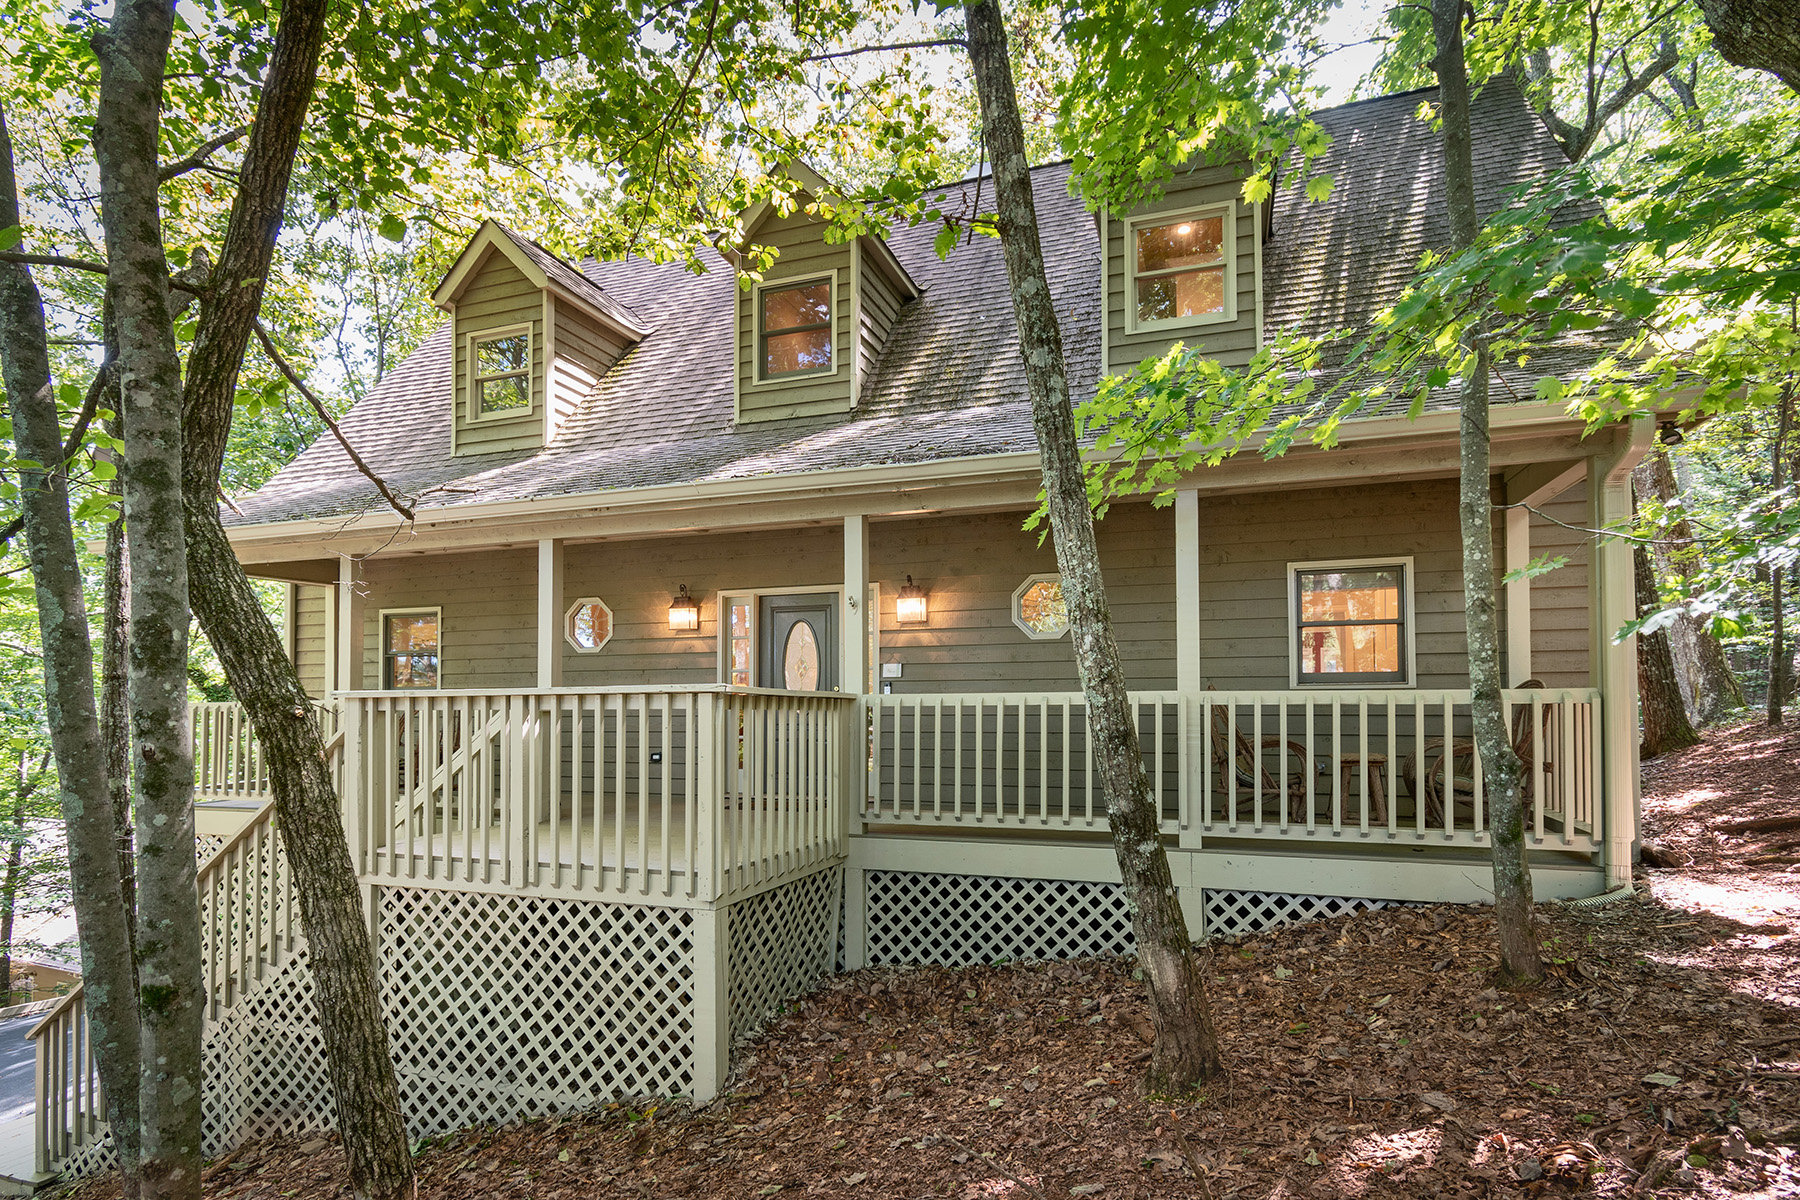 Single Family Homes pour l Vente à Like New Mountain Cottage On Cul-De-Sac Gated Community 200 Wild Azalea, Big Canoe, Georgia 30143 États-Unis